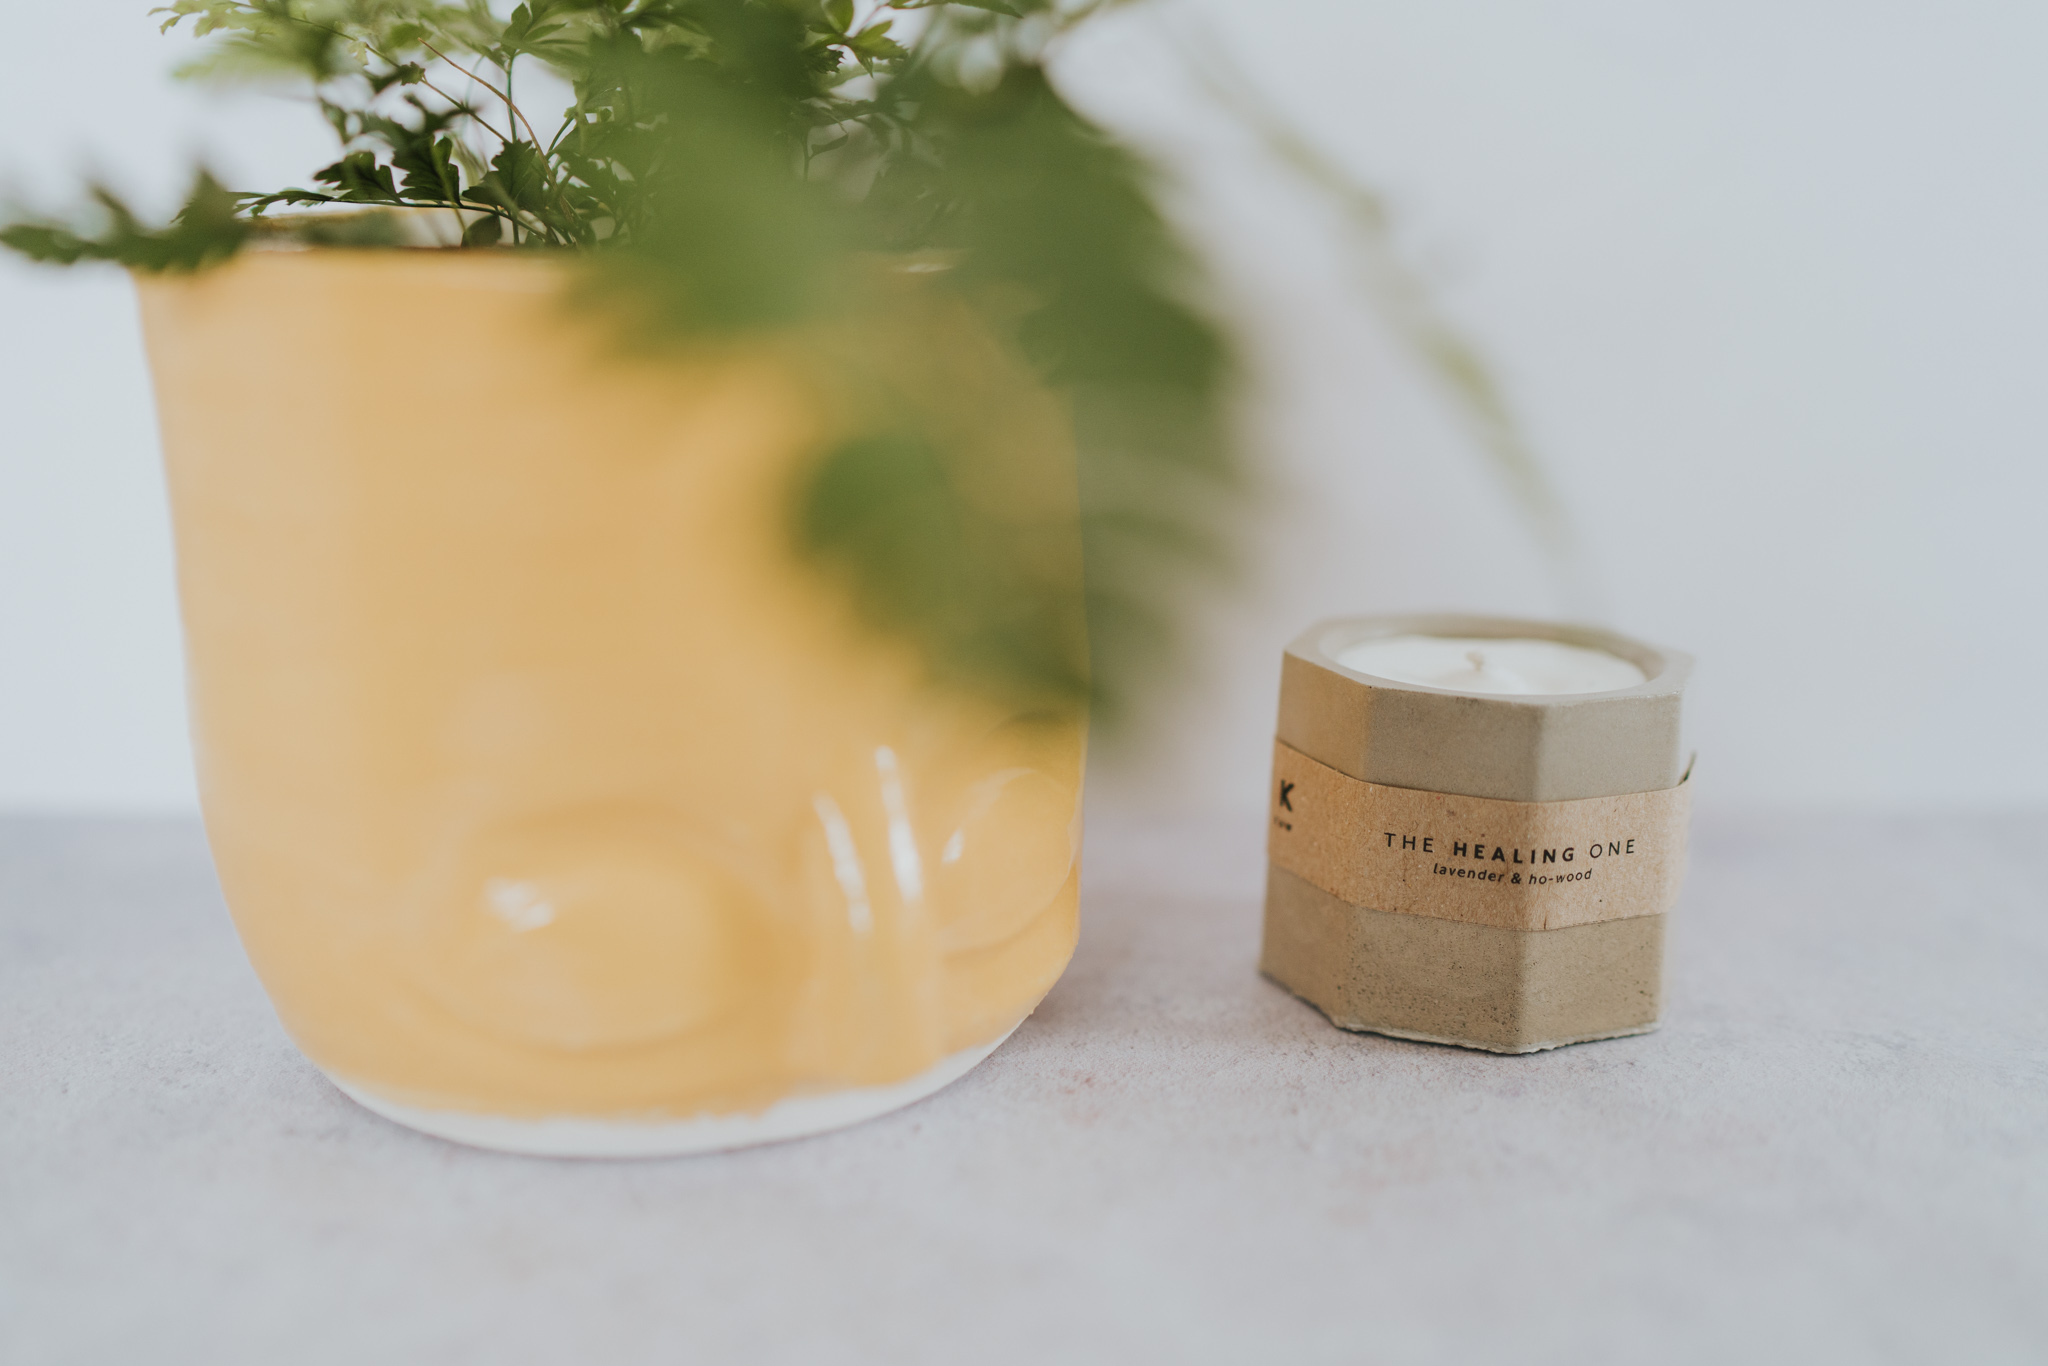 business-branding-panpank-candles-grace-elizabeth-colchester-essex-devon-suffolk-and-norfolk-alternative-wedding-and-family-photographer (6 of 19).jpg